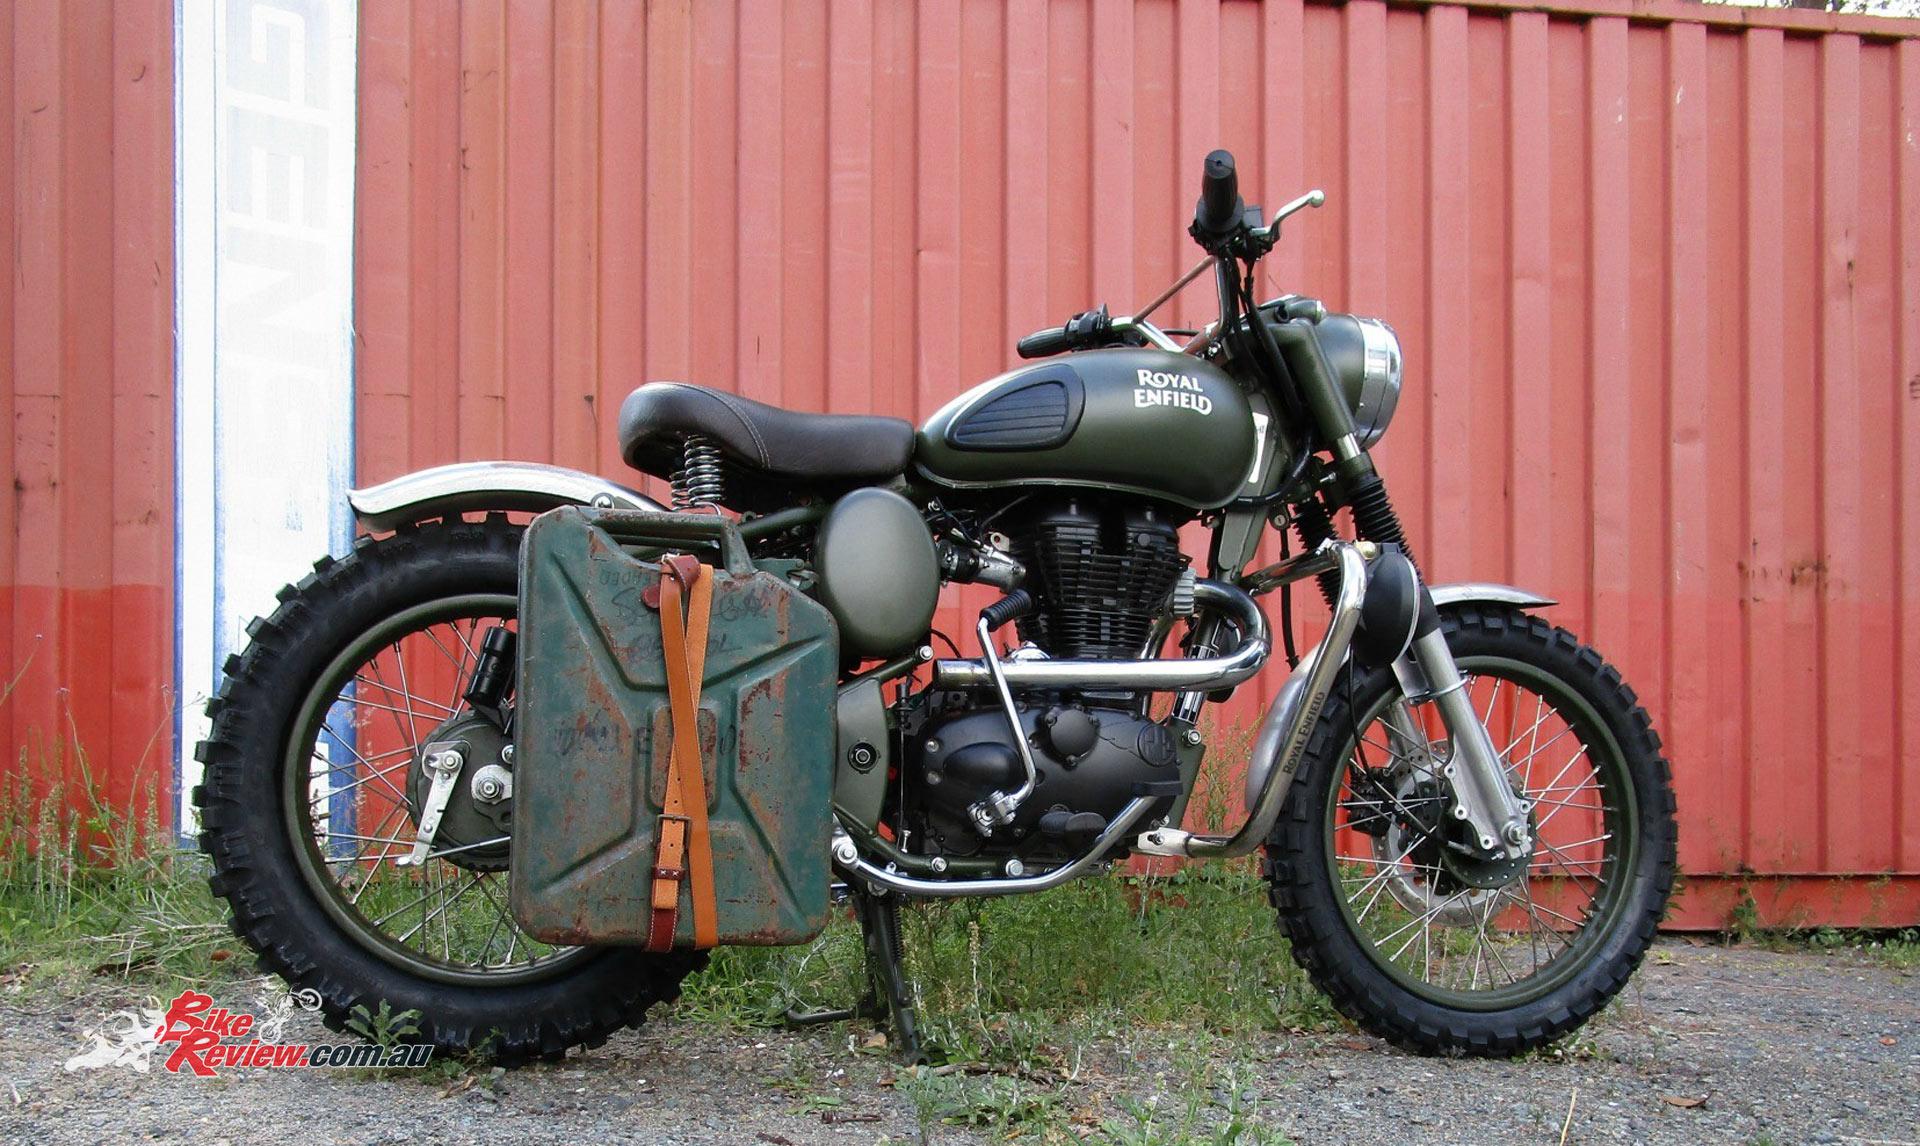 'Rock the Casbar' Noosa Motorcycles - Noosaville